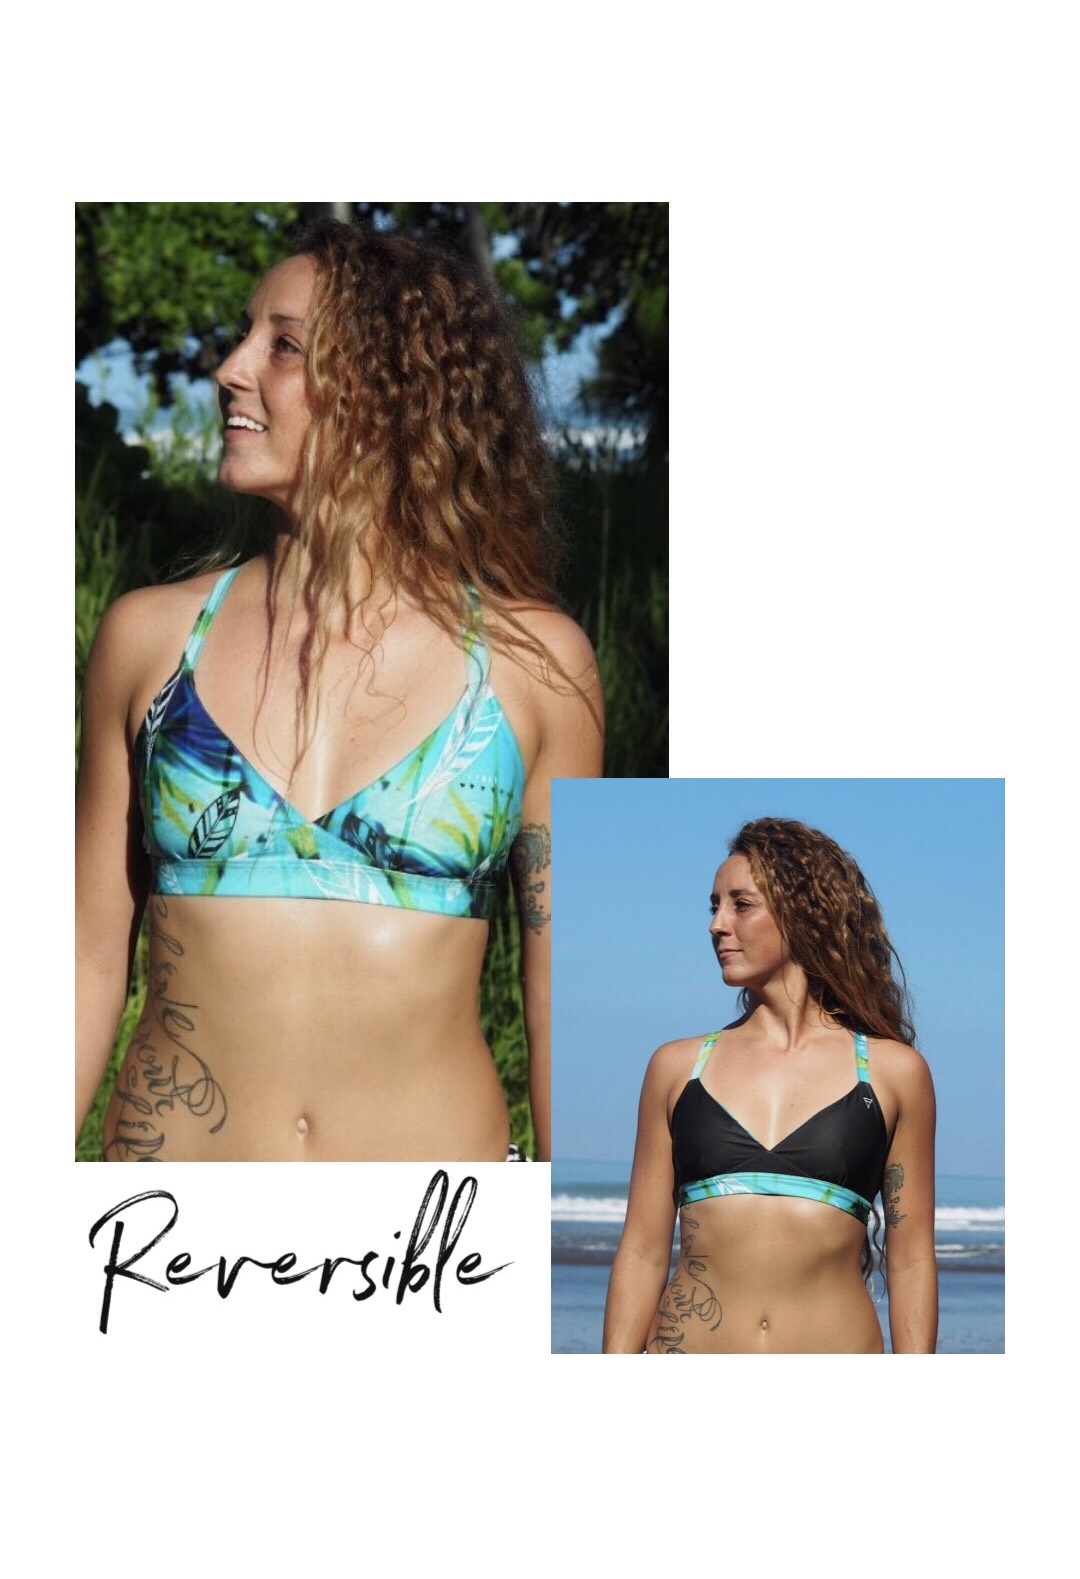 b3c83bb698 Triangle Top | Sustainable Surf Bikini by Monique Rotteveel | Night Sky